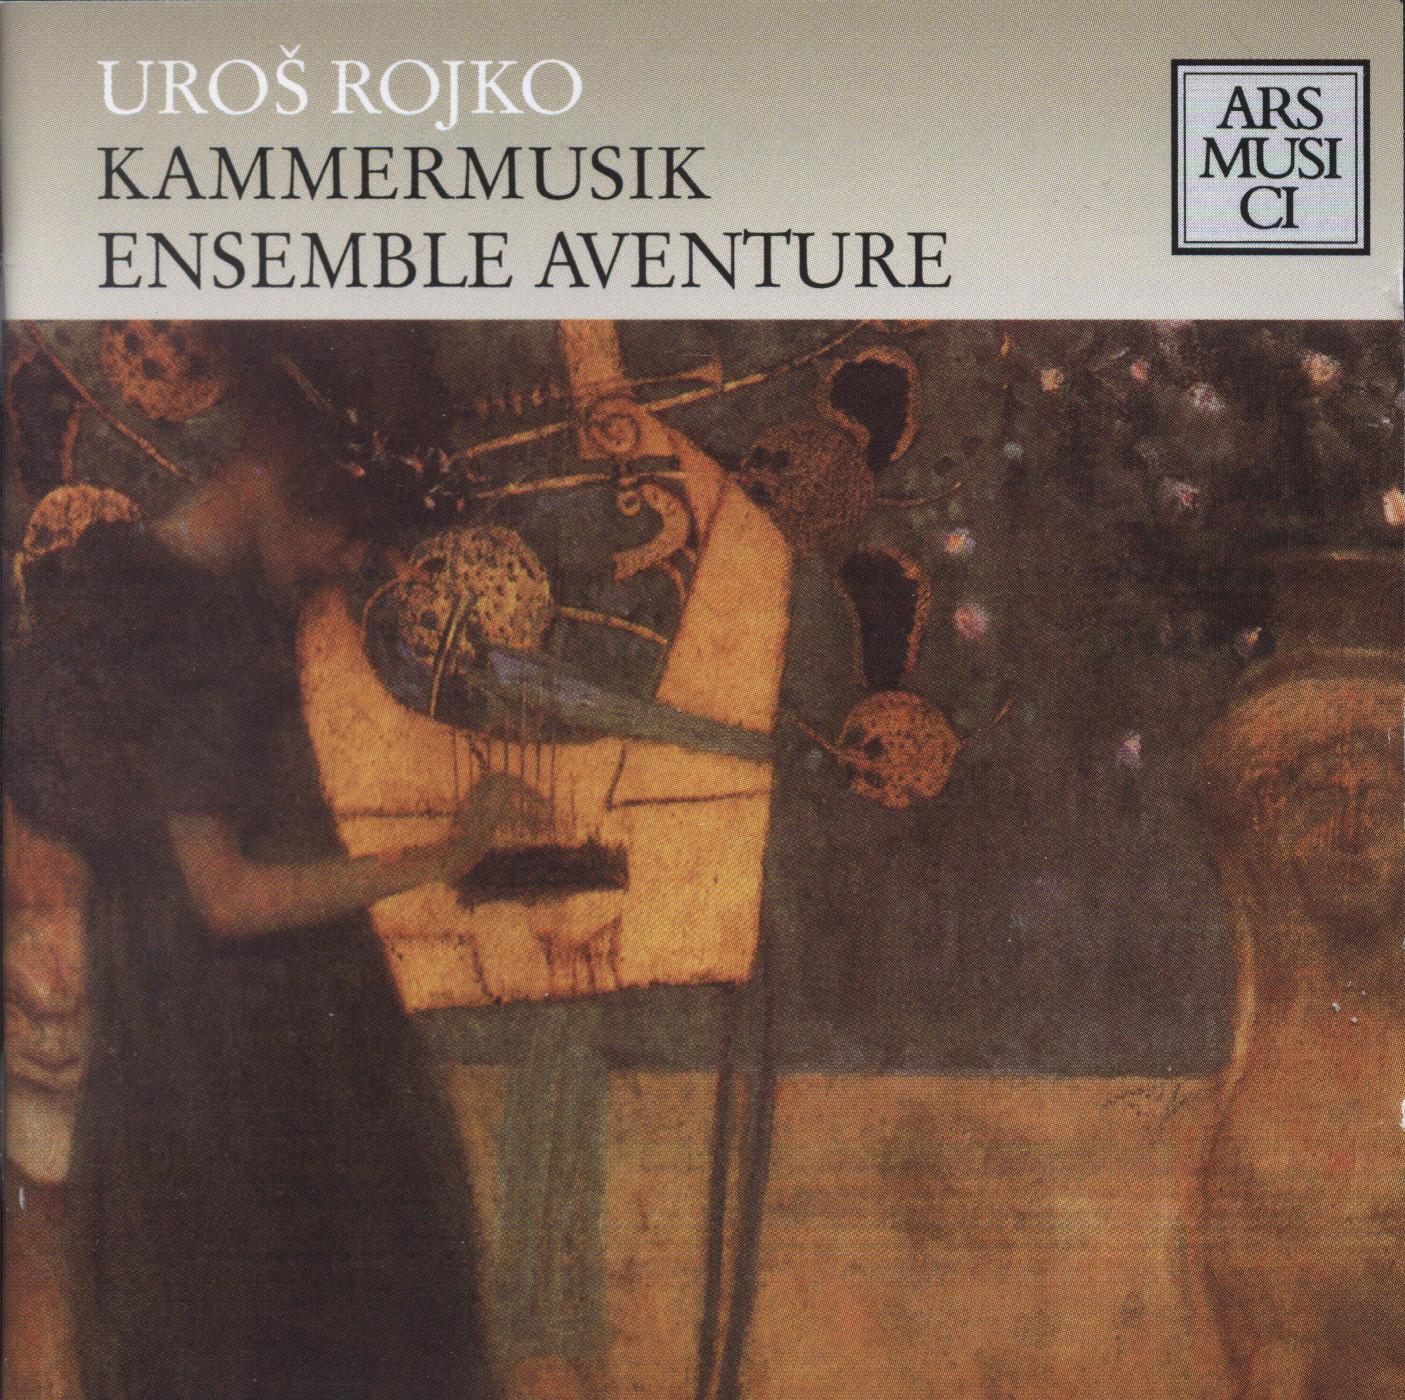 Uros Rojko - Ensemble Aventure & Stefan Hussong